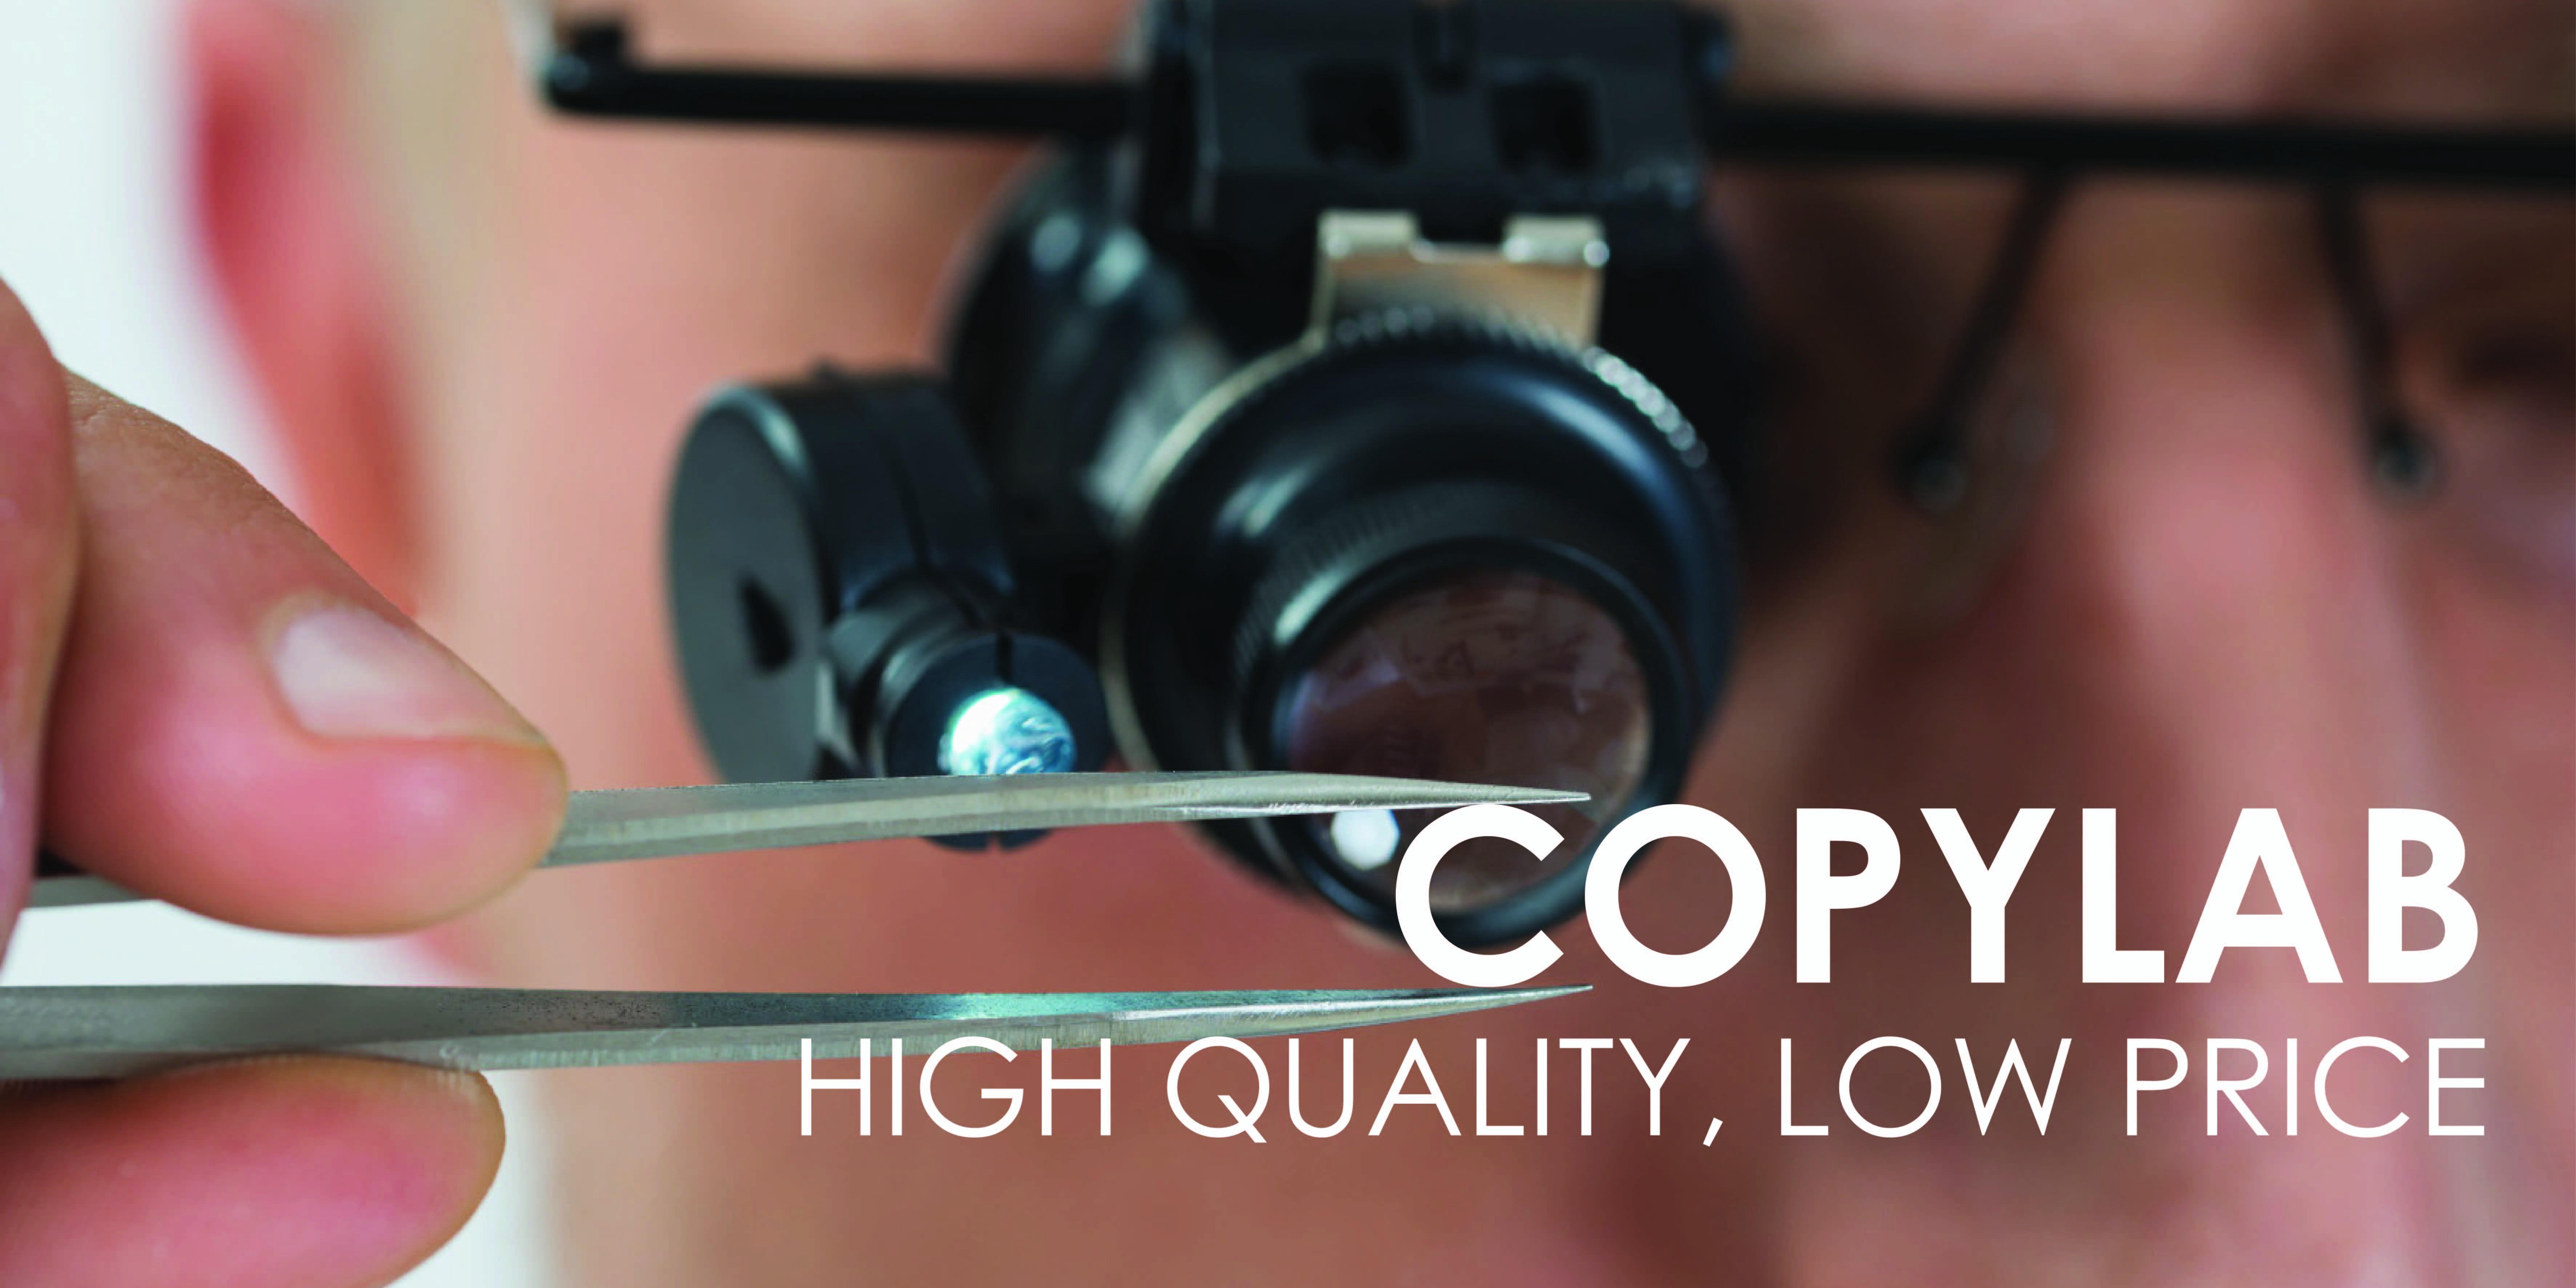 01-High-Quality-Low-Price-01